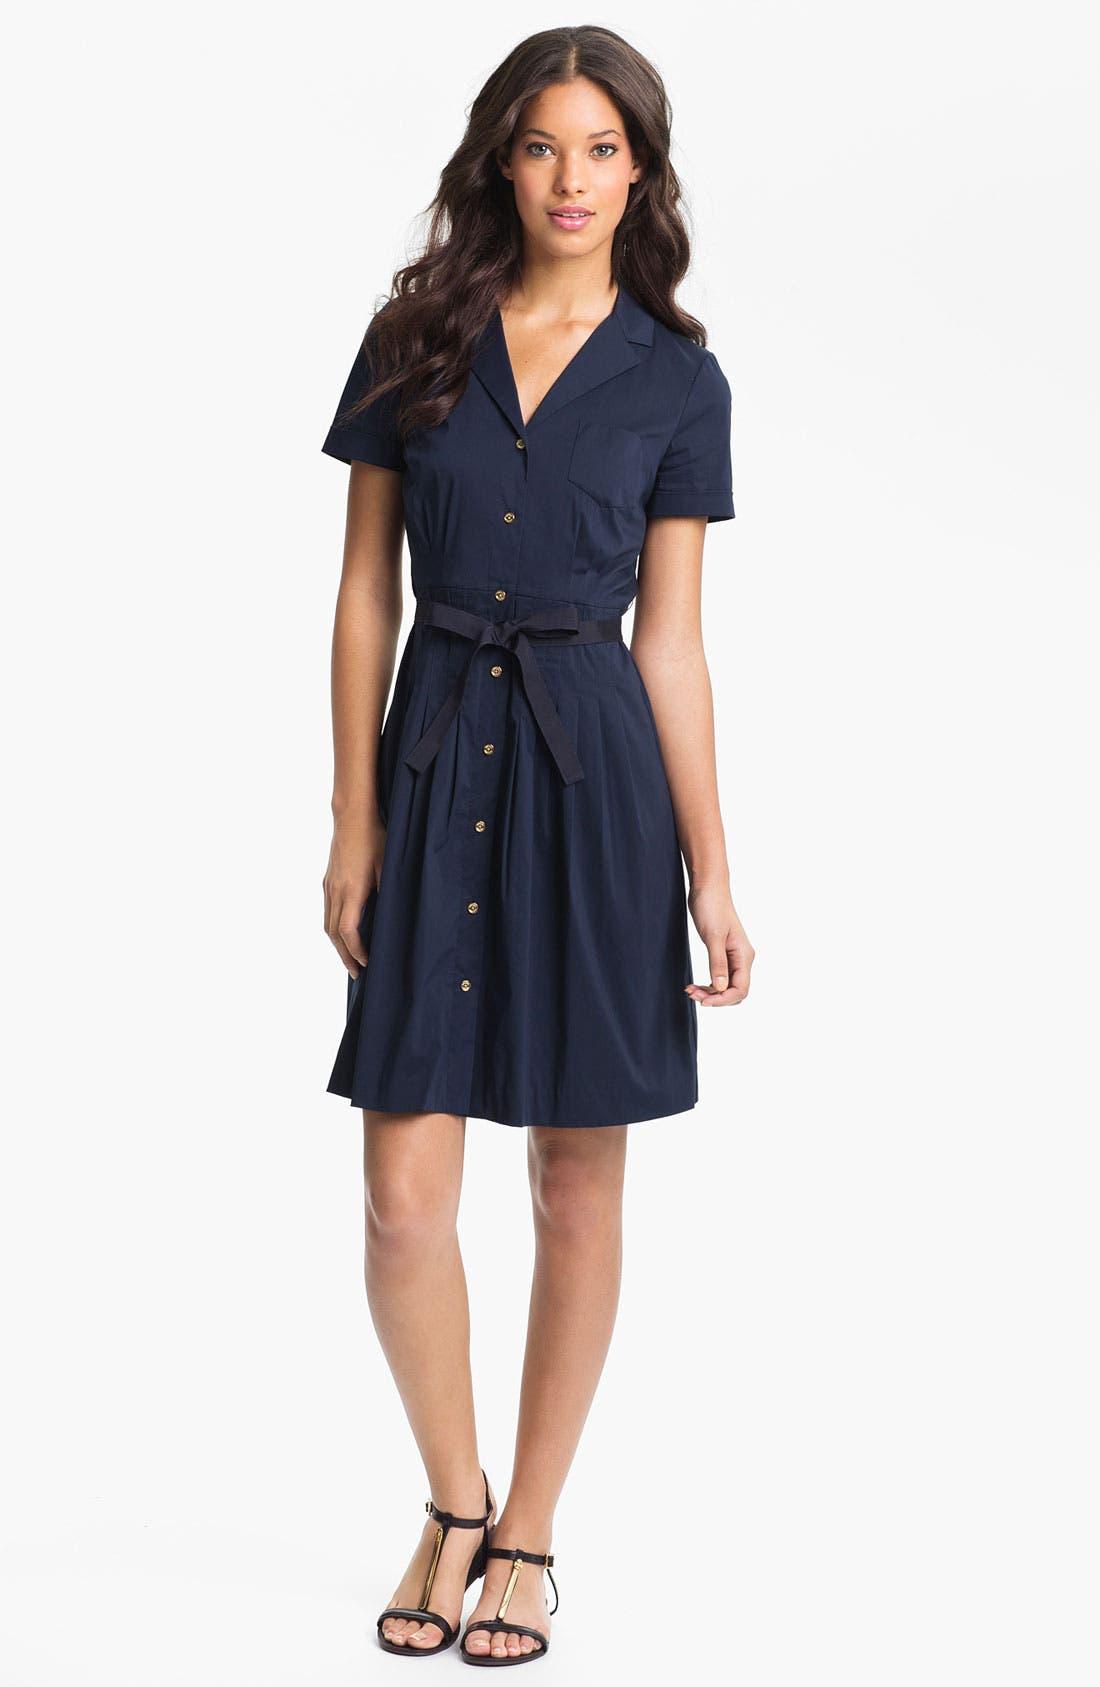 Alternate Image 1 Selected - Tory Burch 'Janet' Cotton Blend Shirtdress